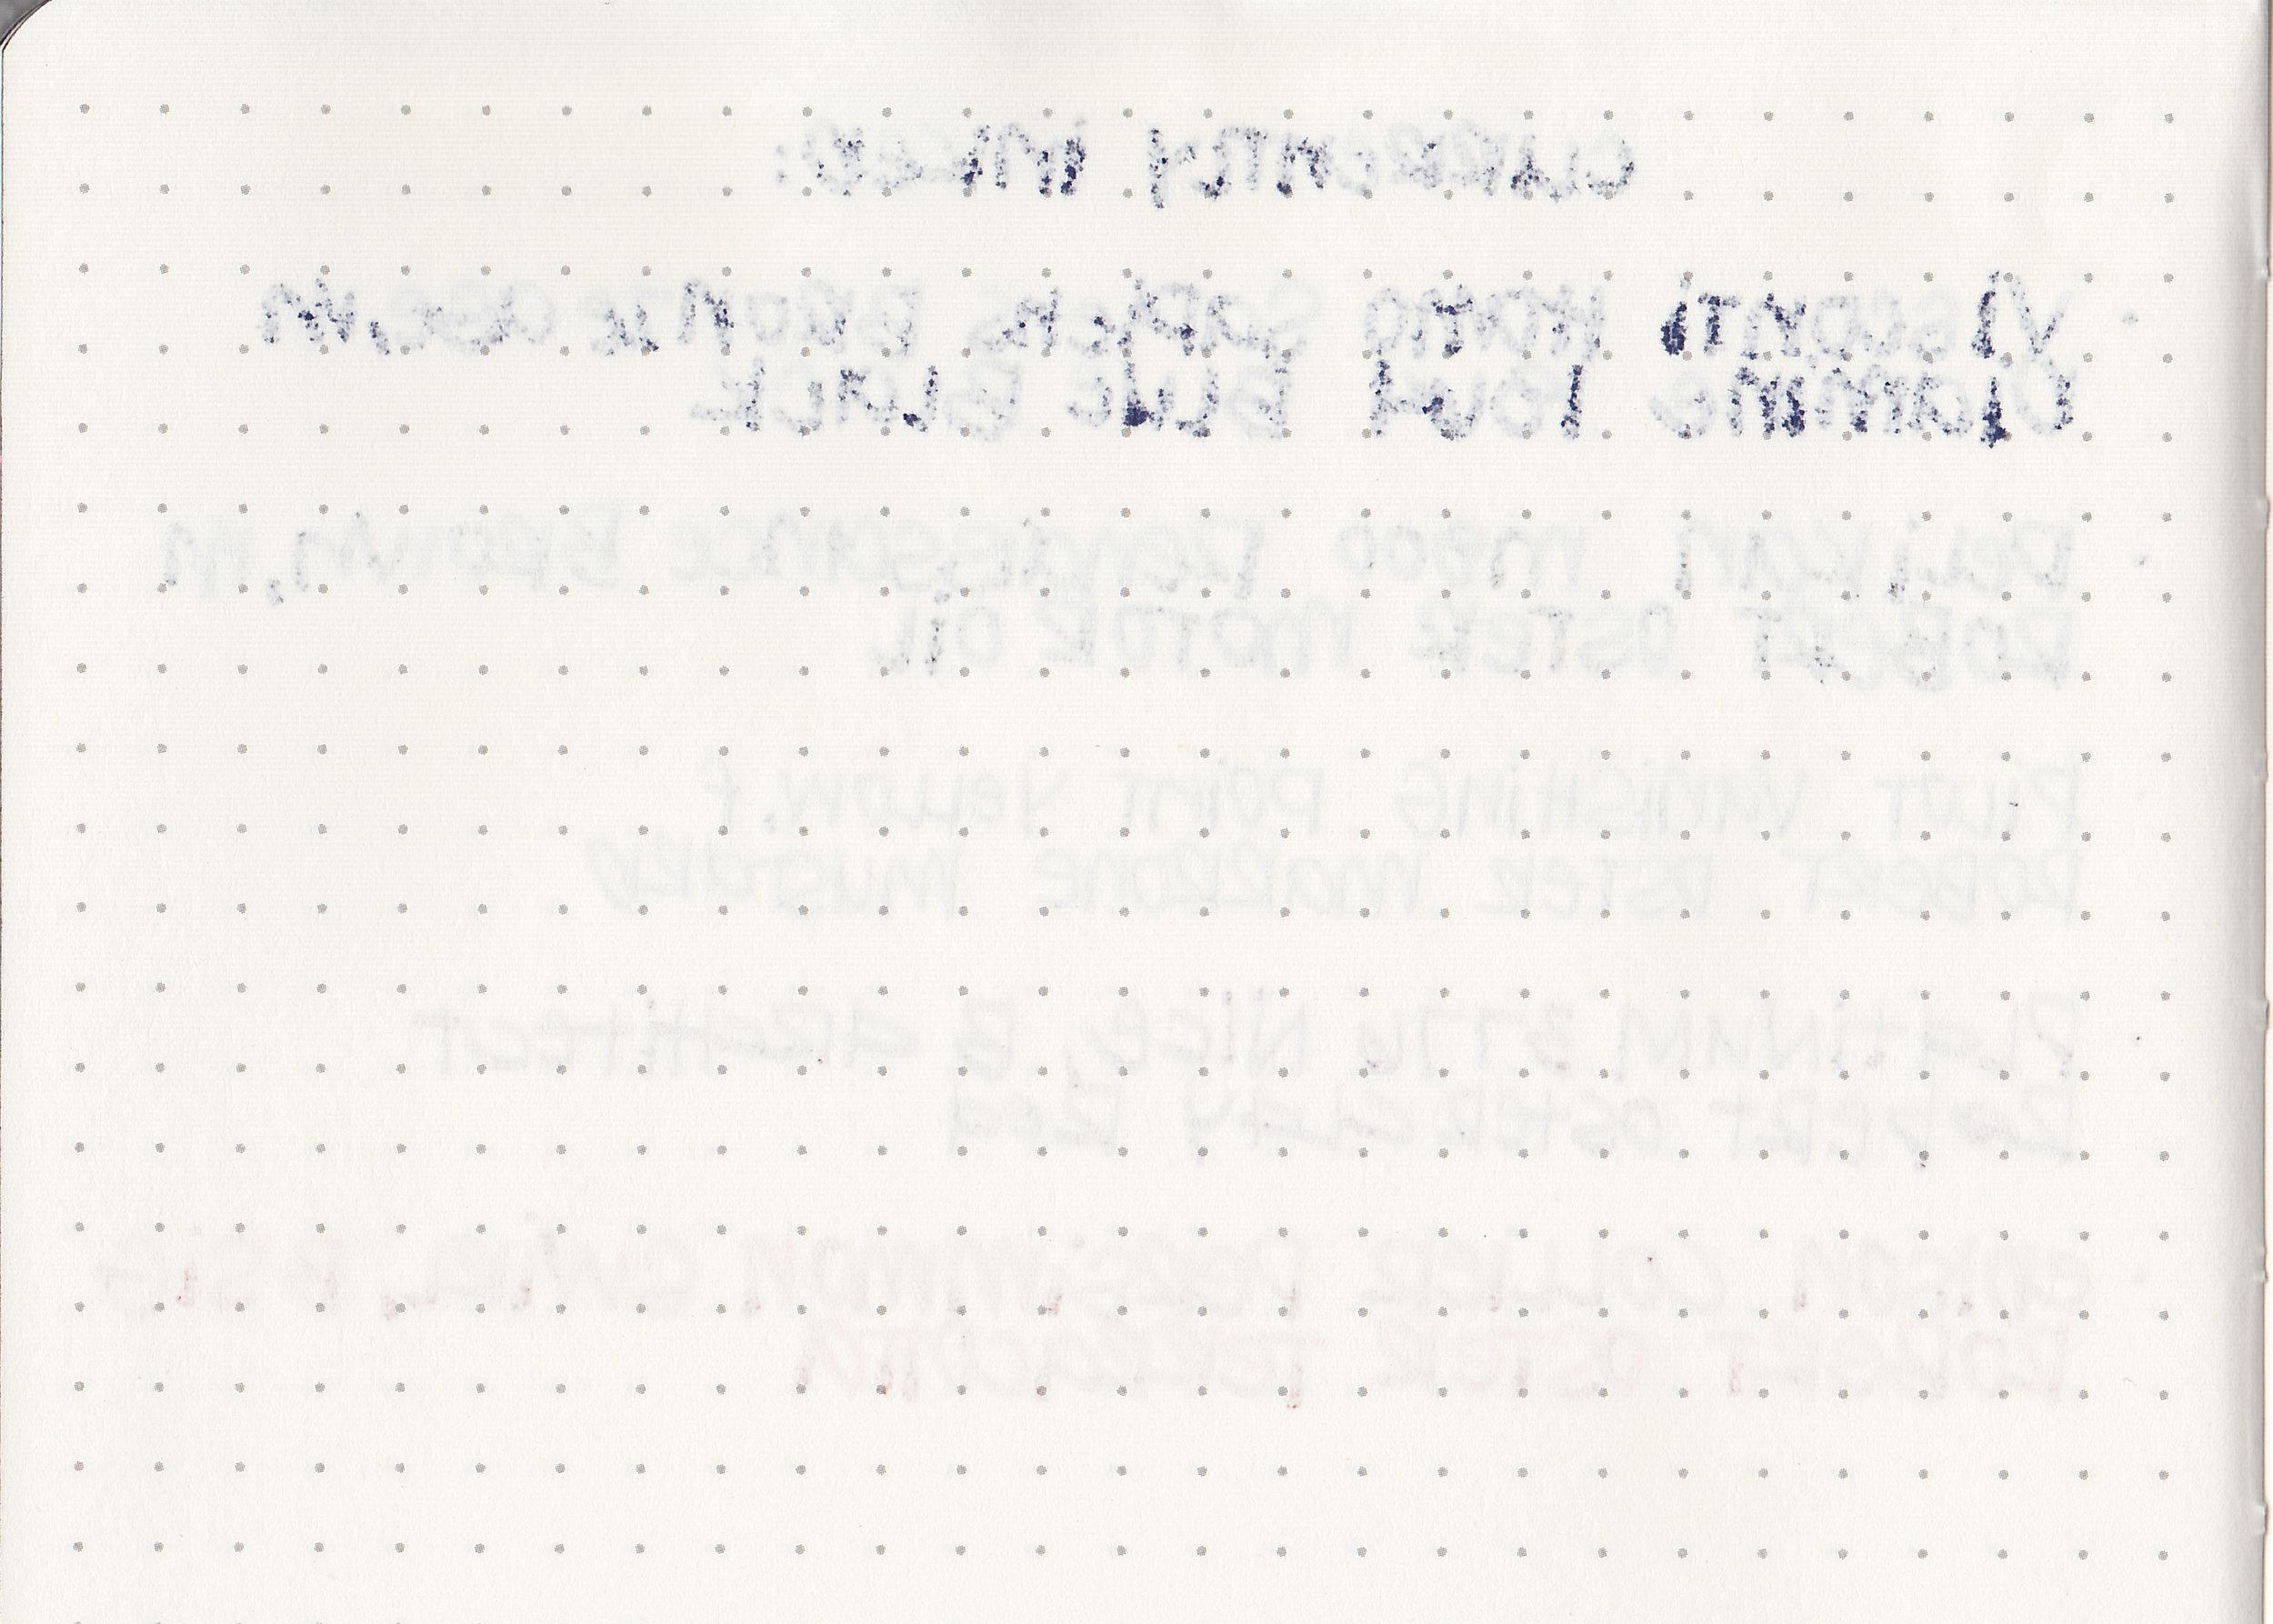 elements-notebook-w-6.jpg